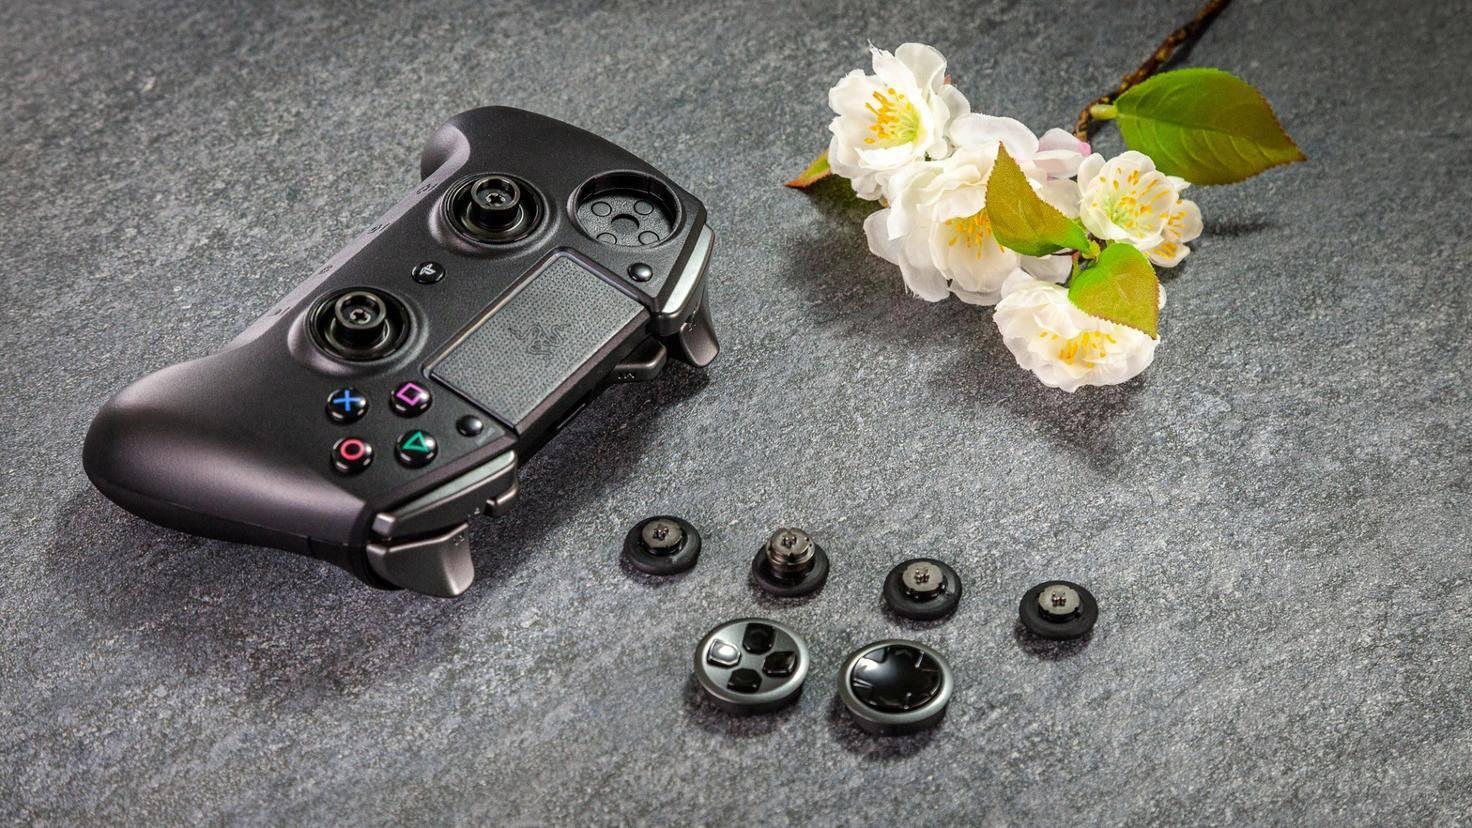 razer-raiju-ultimate-controller-ps4-test-02